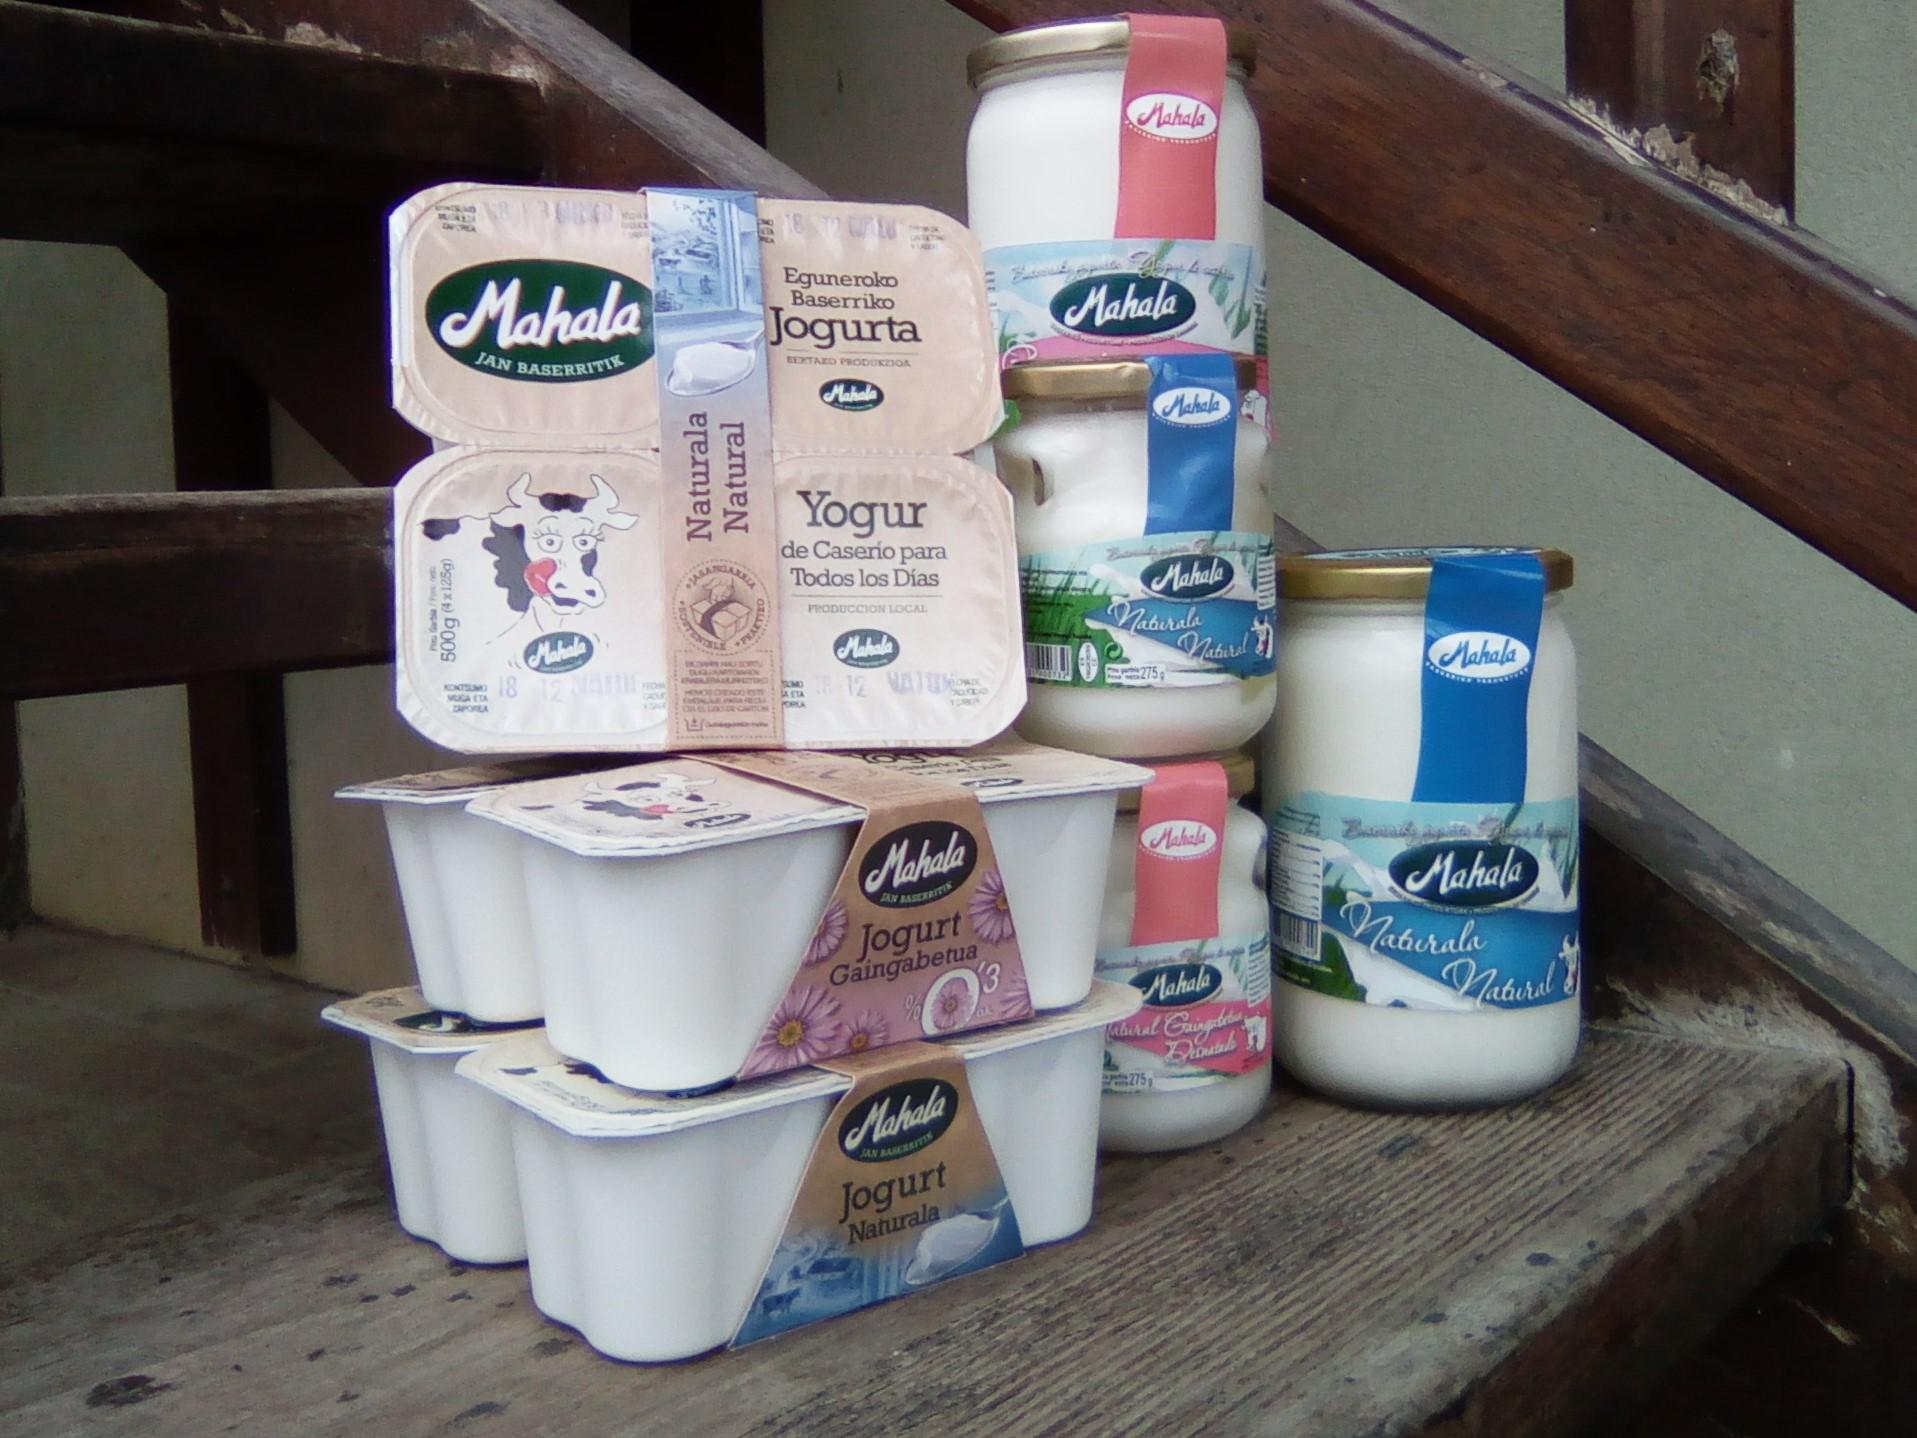 Mahala jogurt naturalak